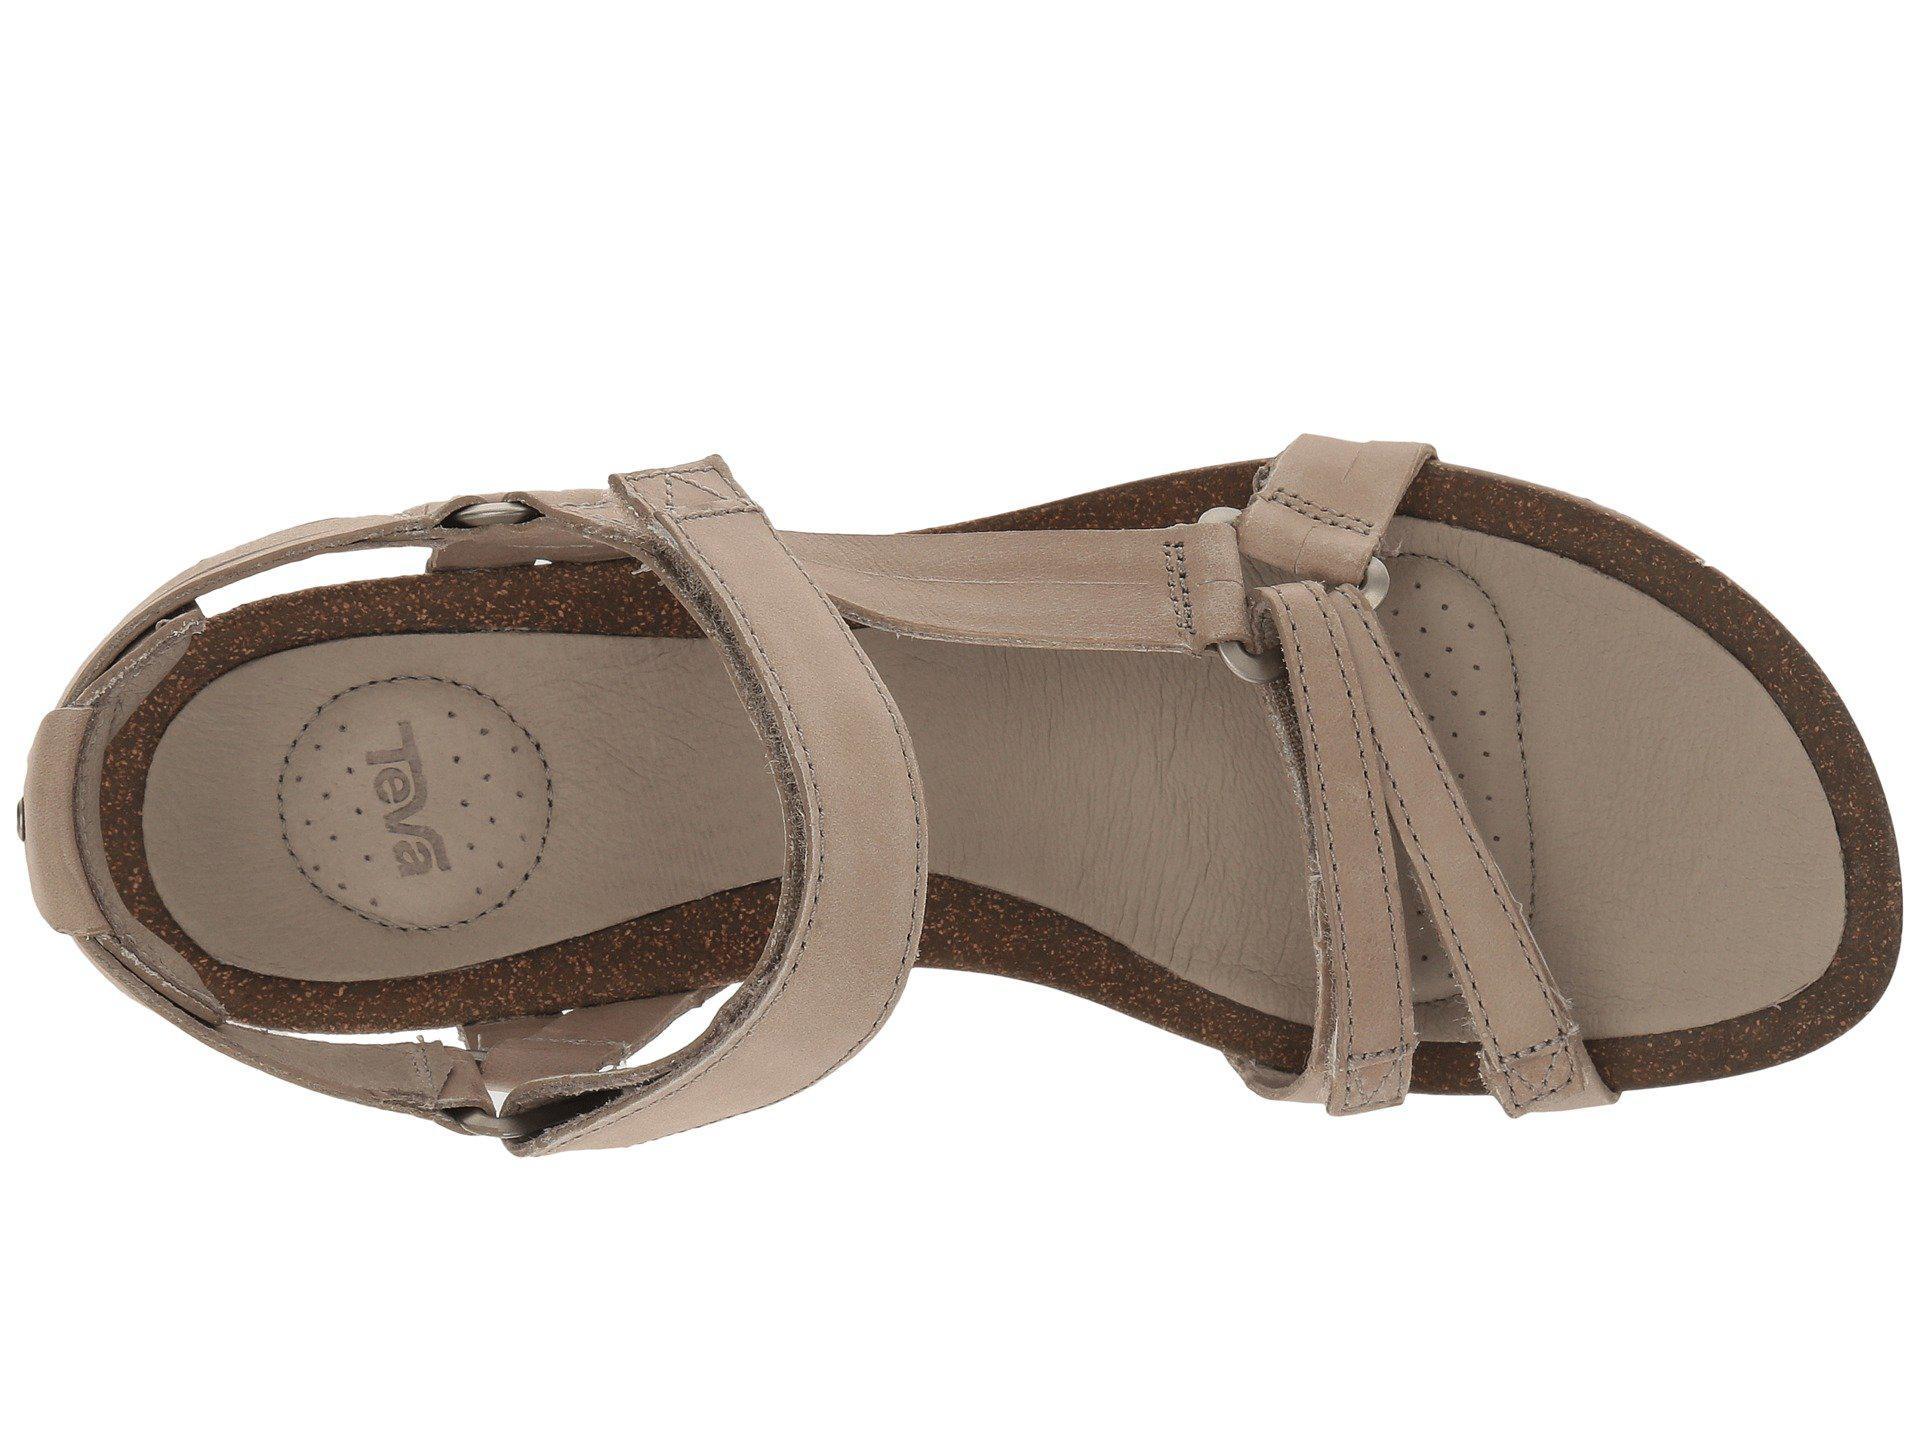 1a806382e6fd5 Teva - Brown Ysidro Universal Wedge (black) Women s Wedge Shoes - Lyst.  View fullscreen